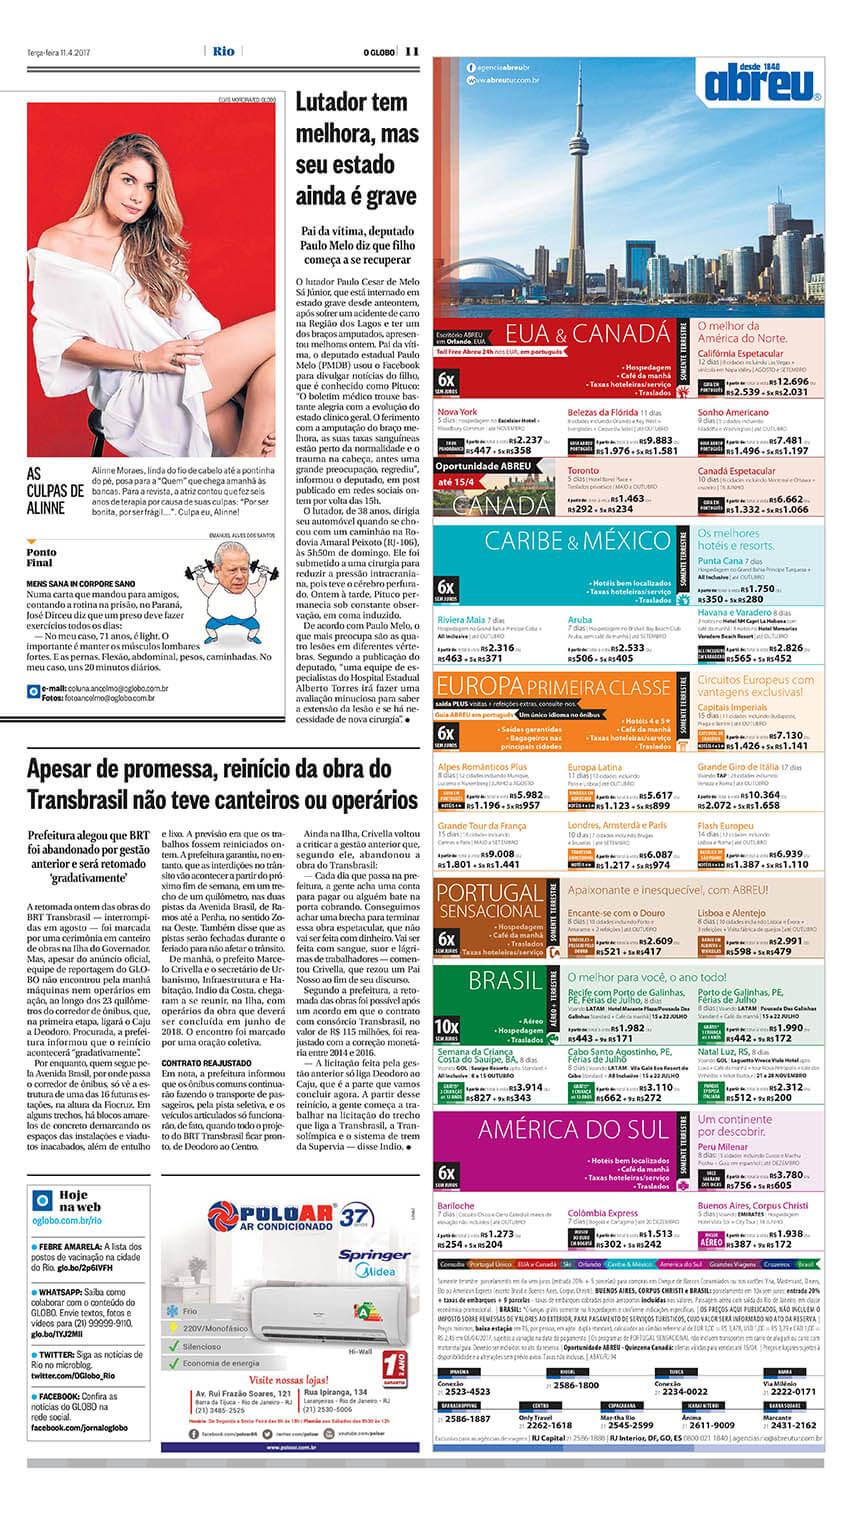 Lovaz - Agência de Publicidade